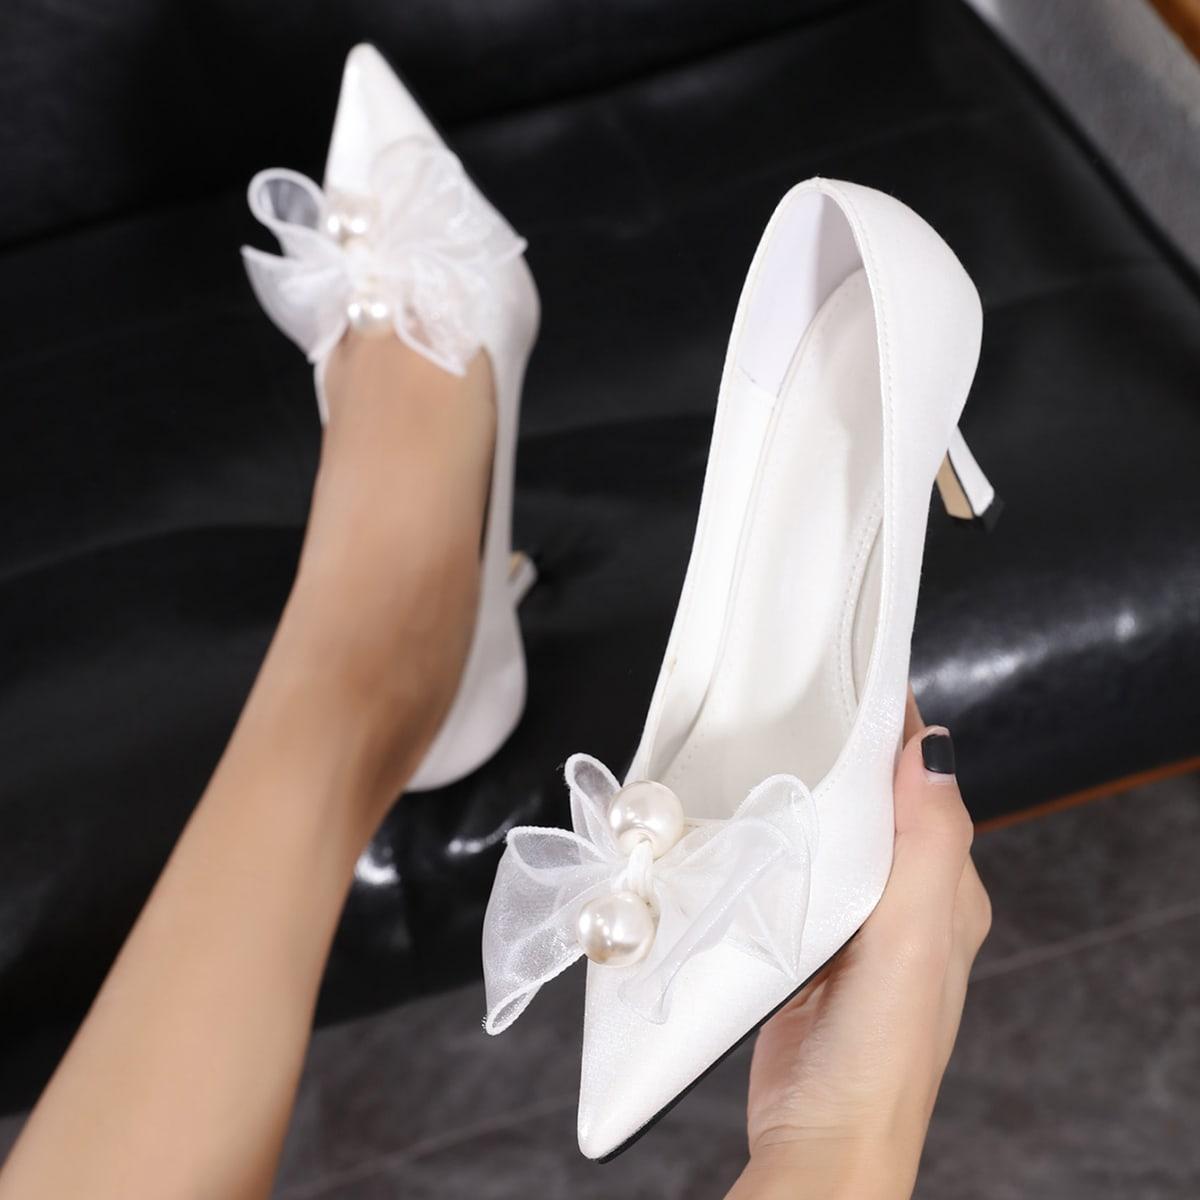 Туфли на среднем каблуке с бантом